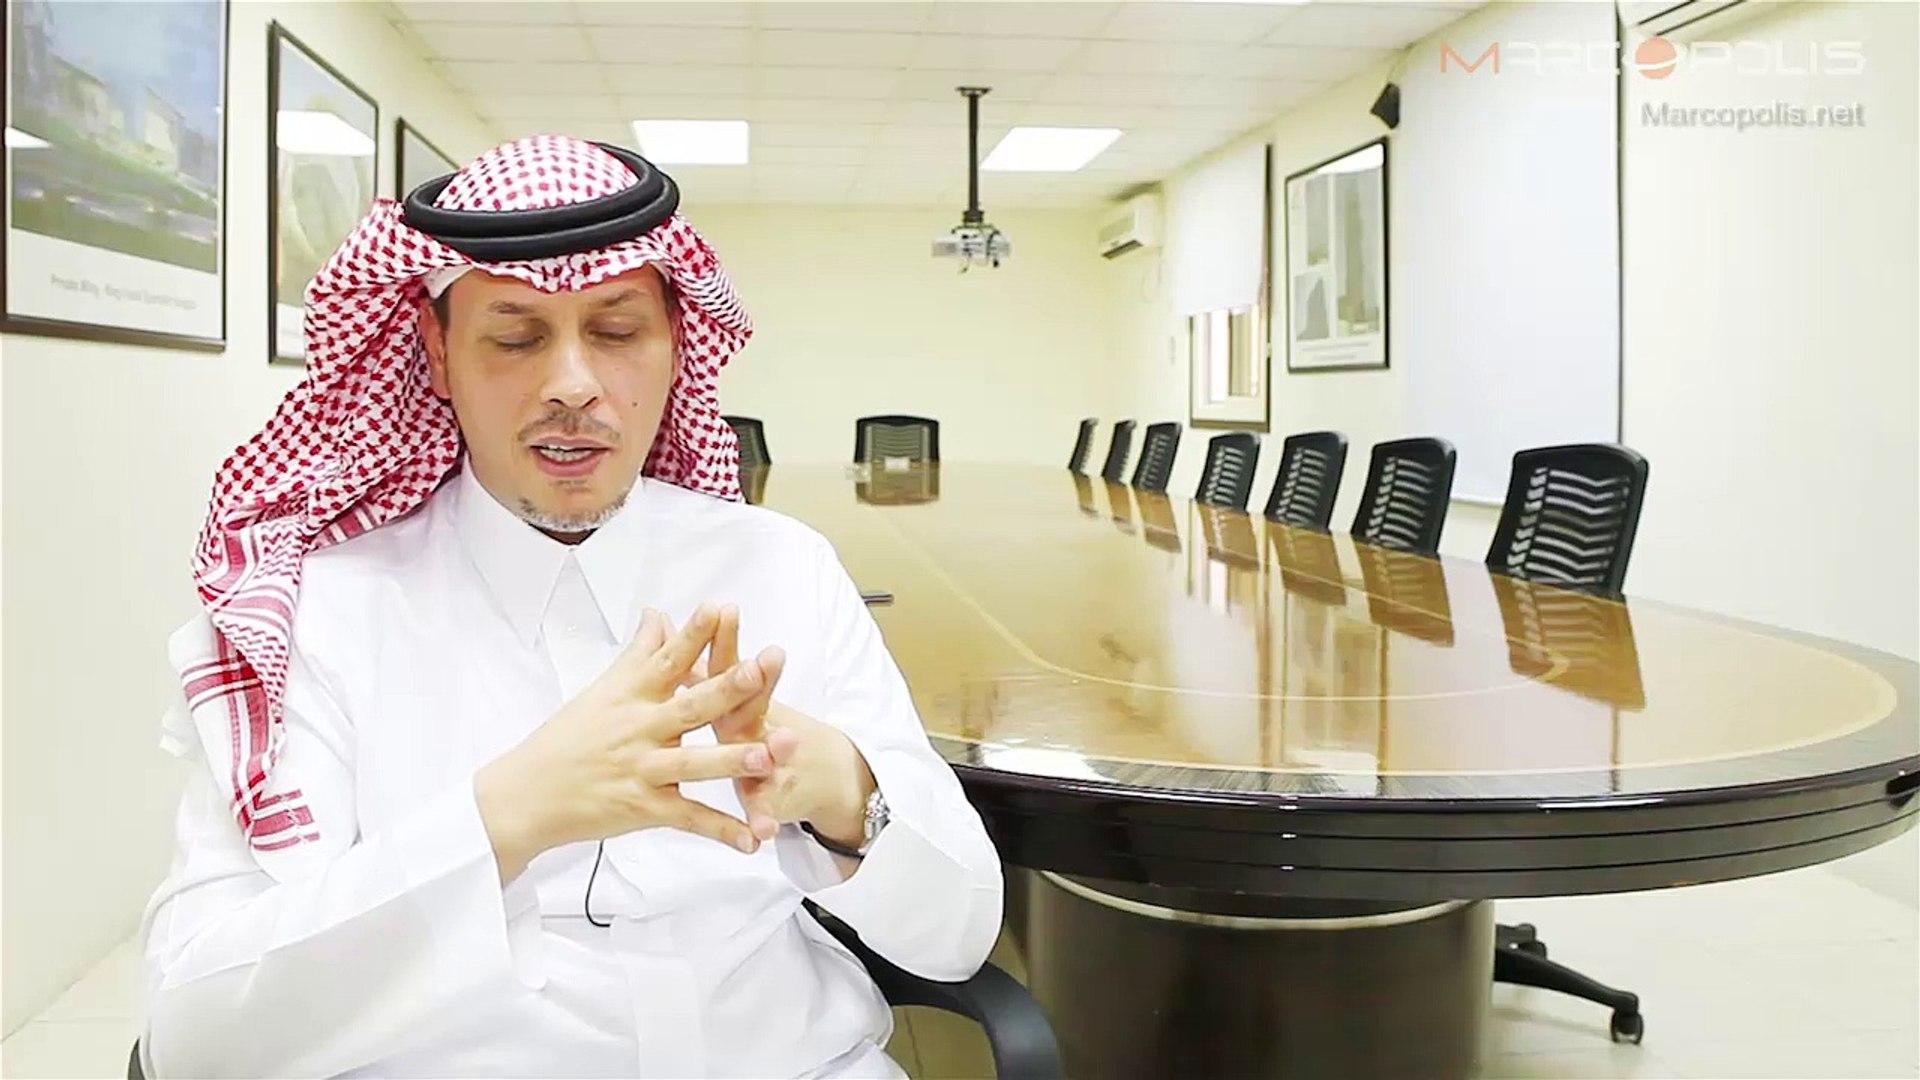 Contracting Market in Saudi Arabia 2016: Al Bawani leading the market